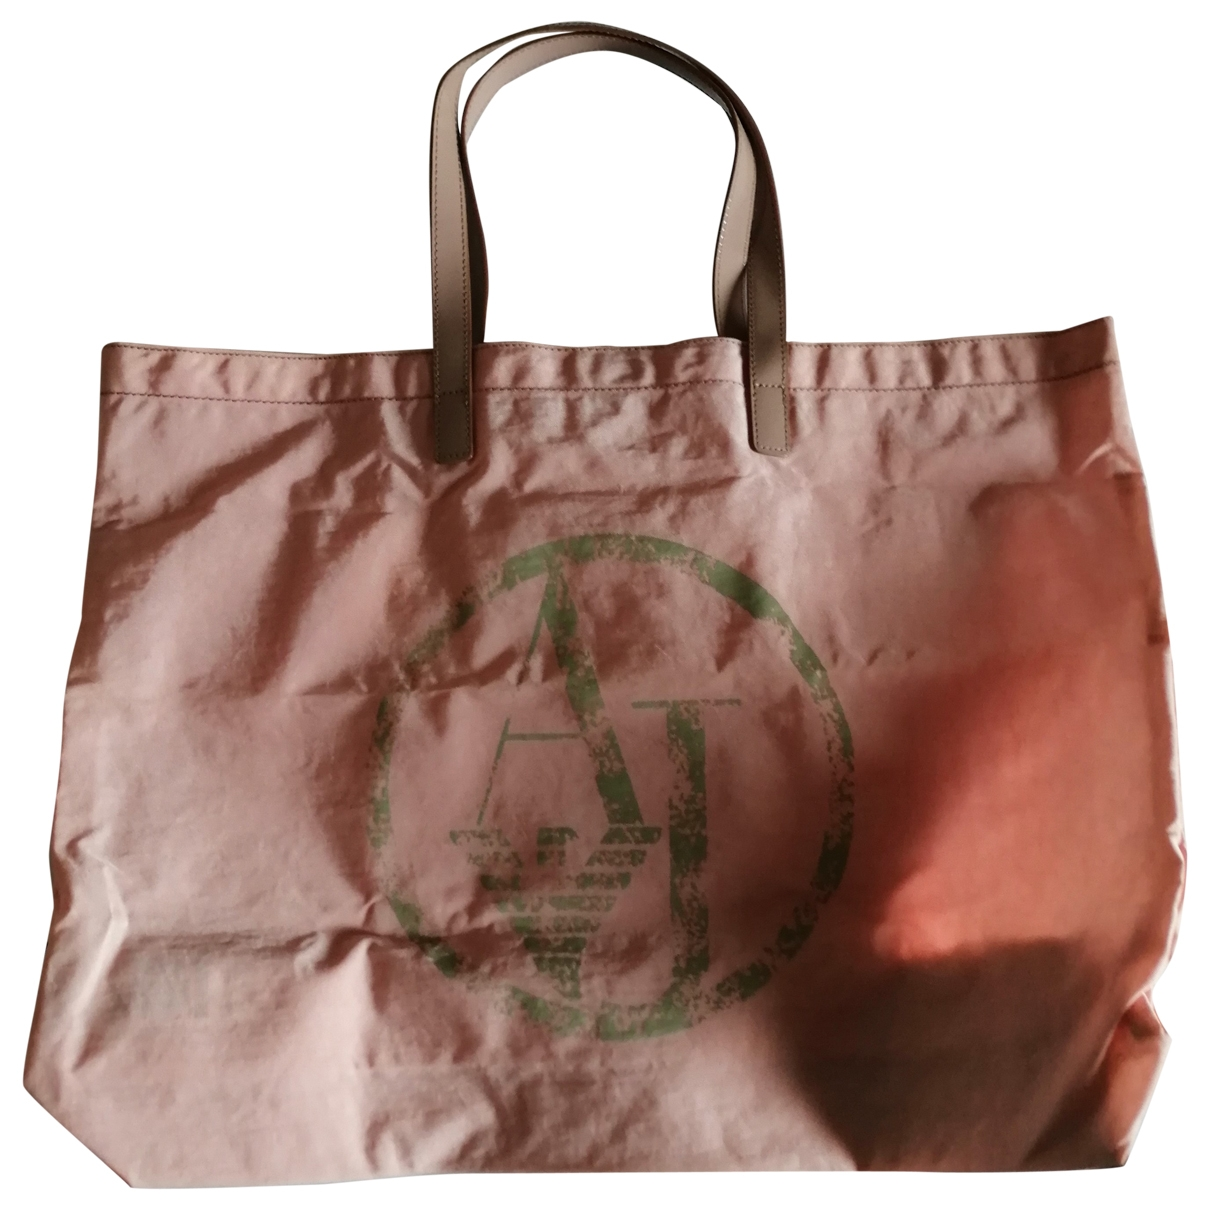 Armani Jeans \N Pink handbag for Women \N